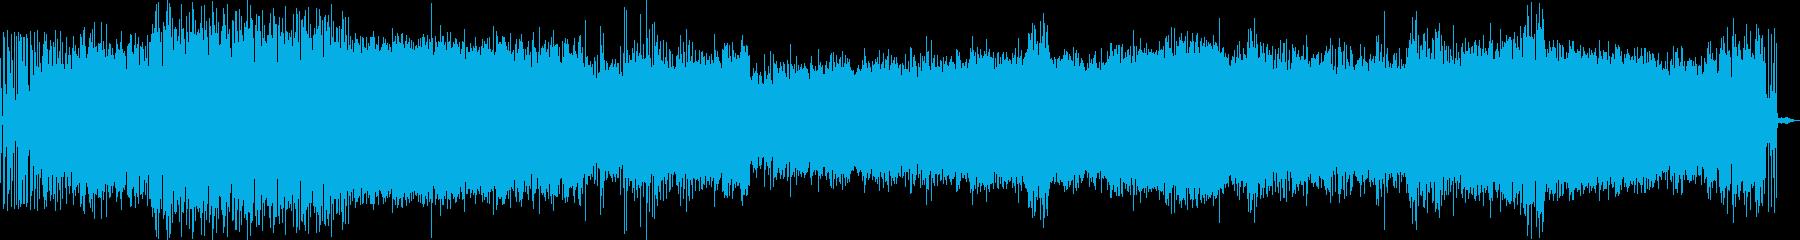 EDM グリッチサウンド の再生済みの波形